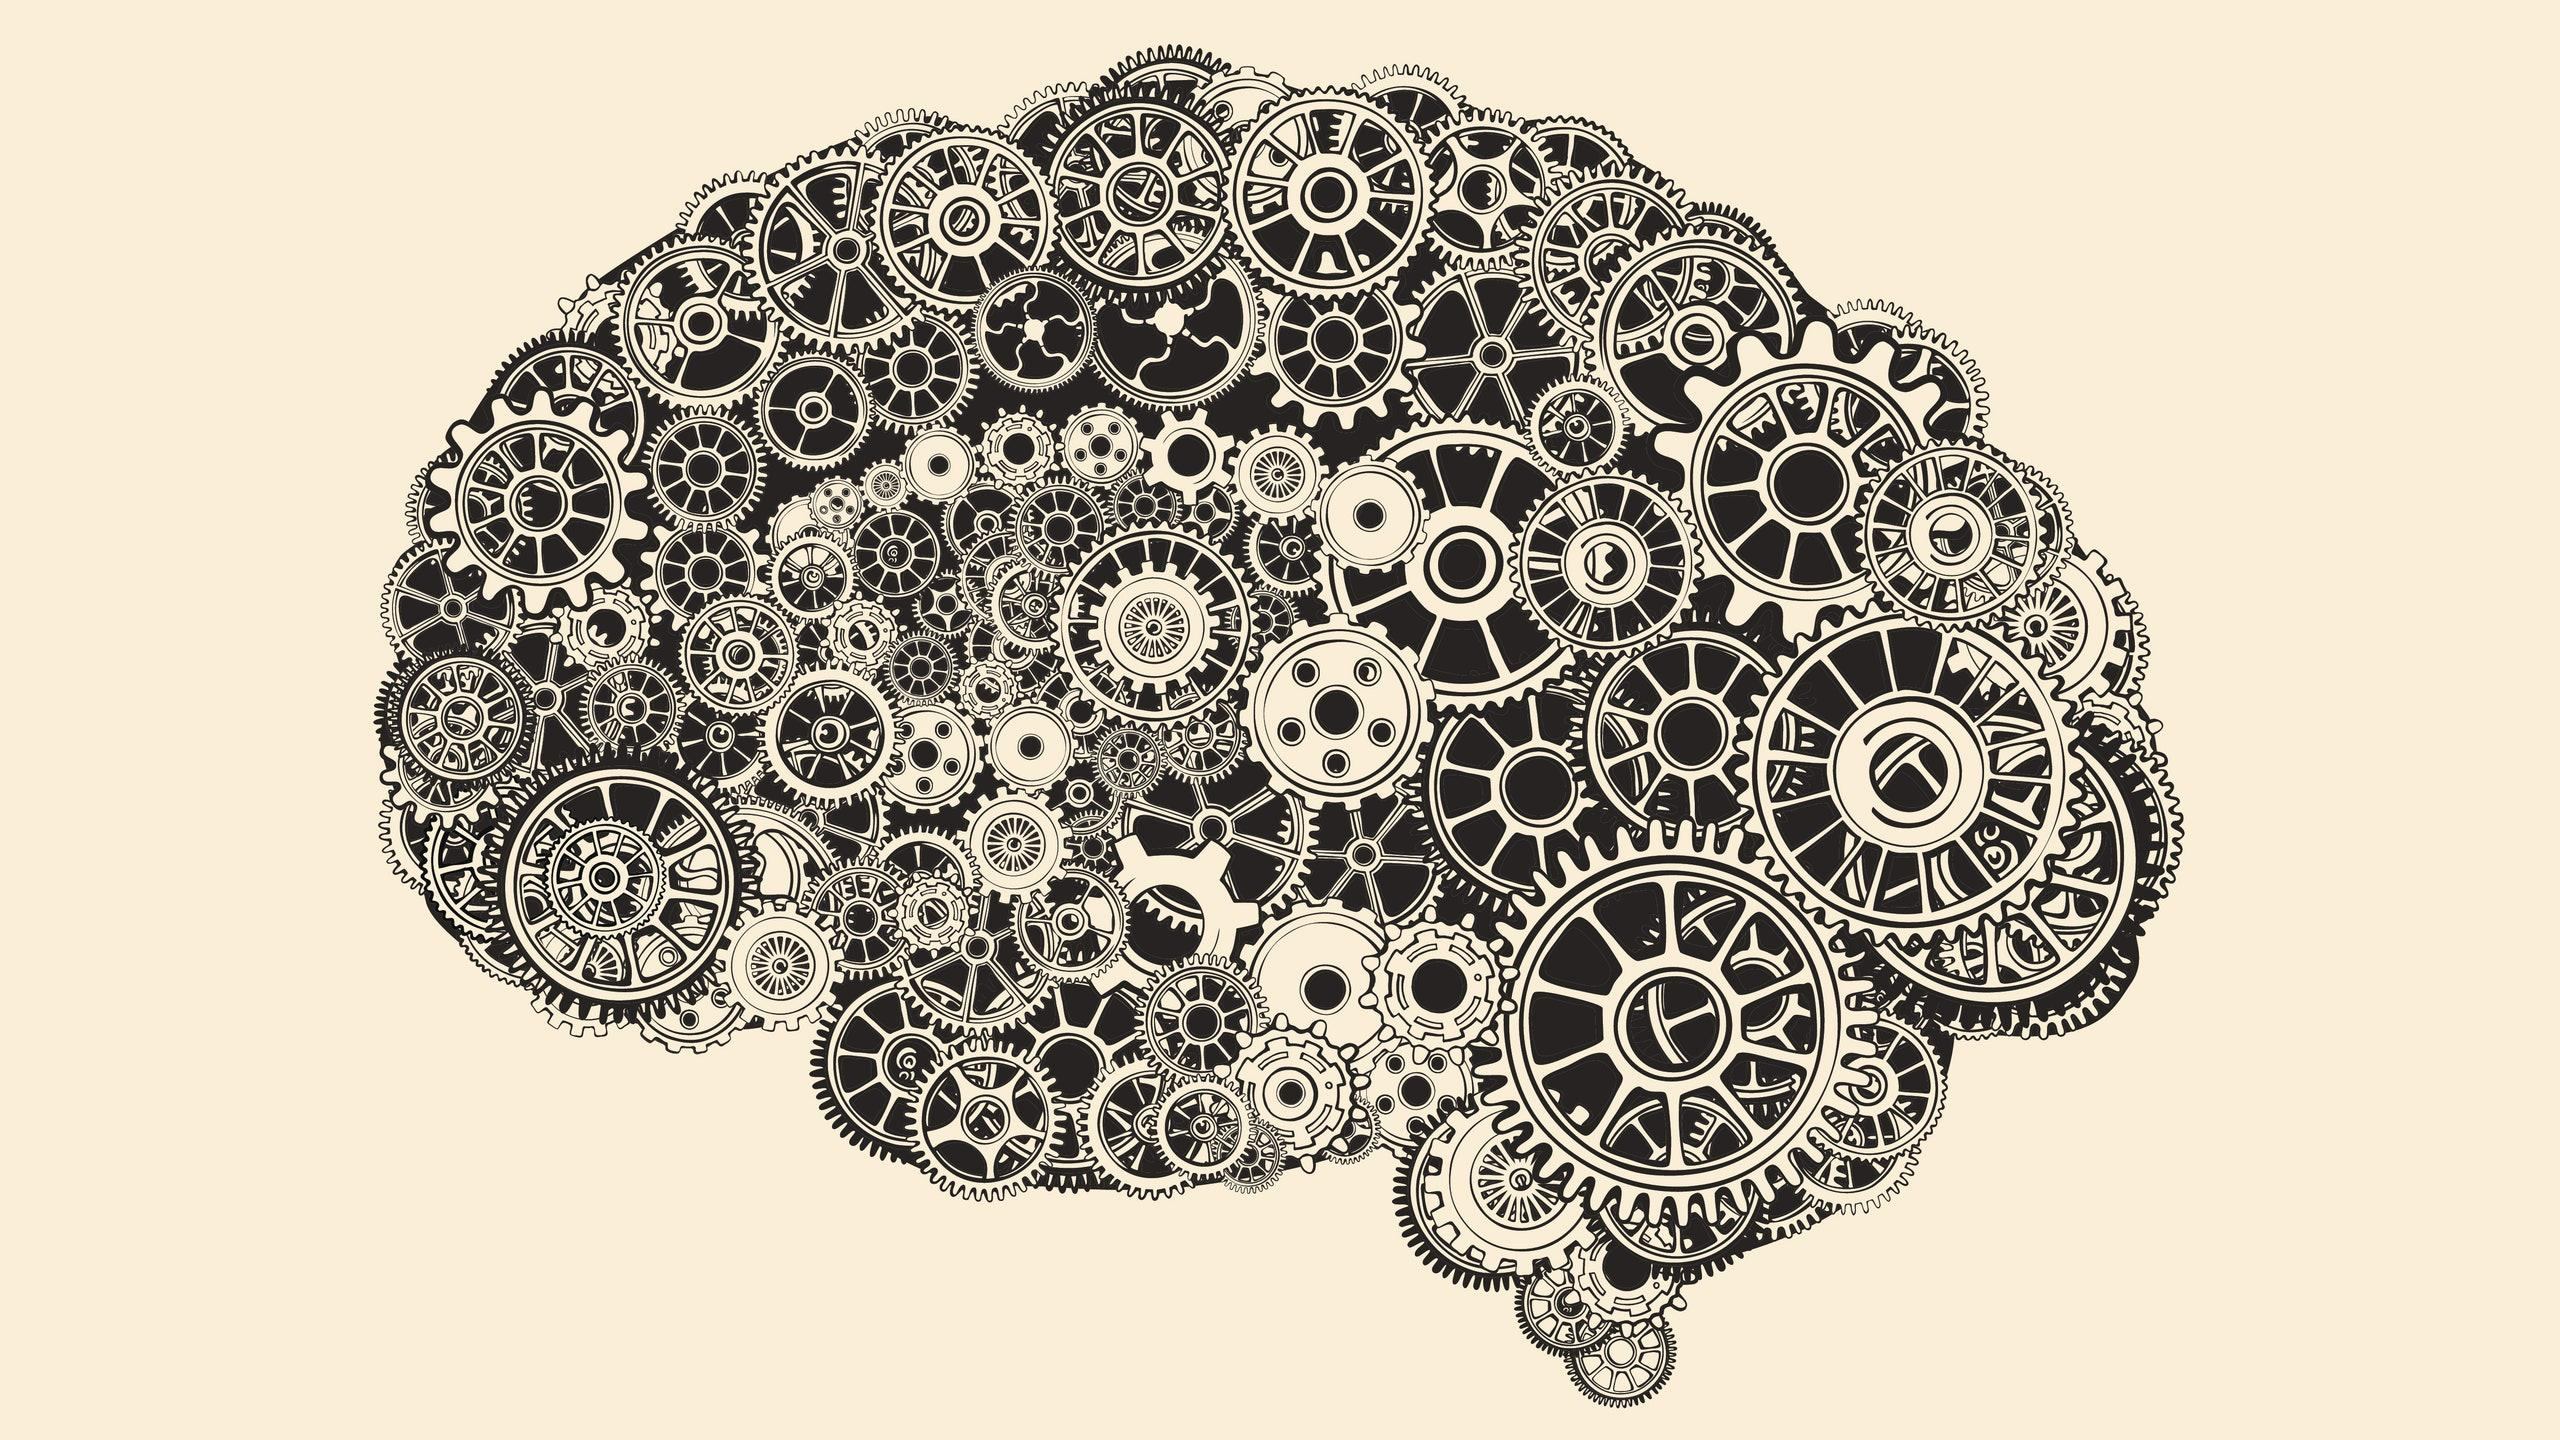 Мозг как прогноз ранней смерти